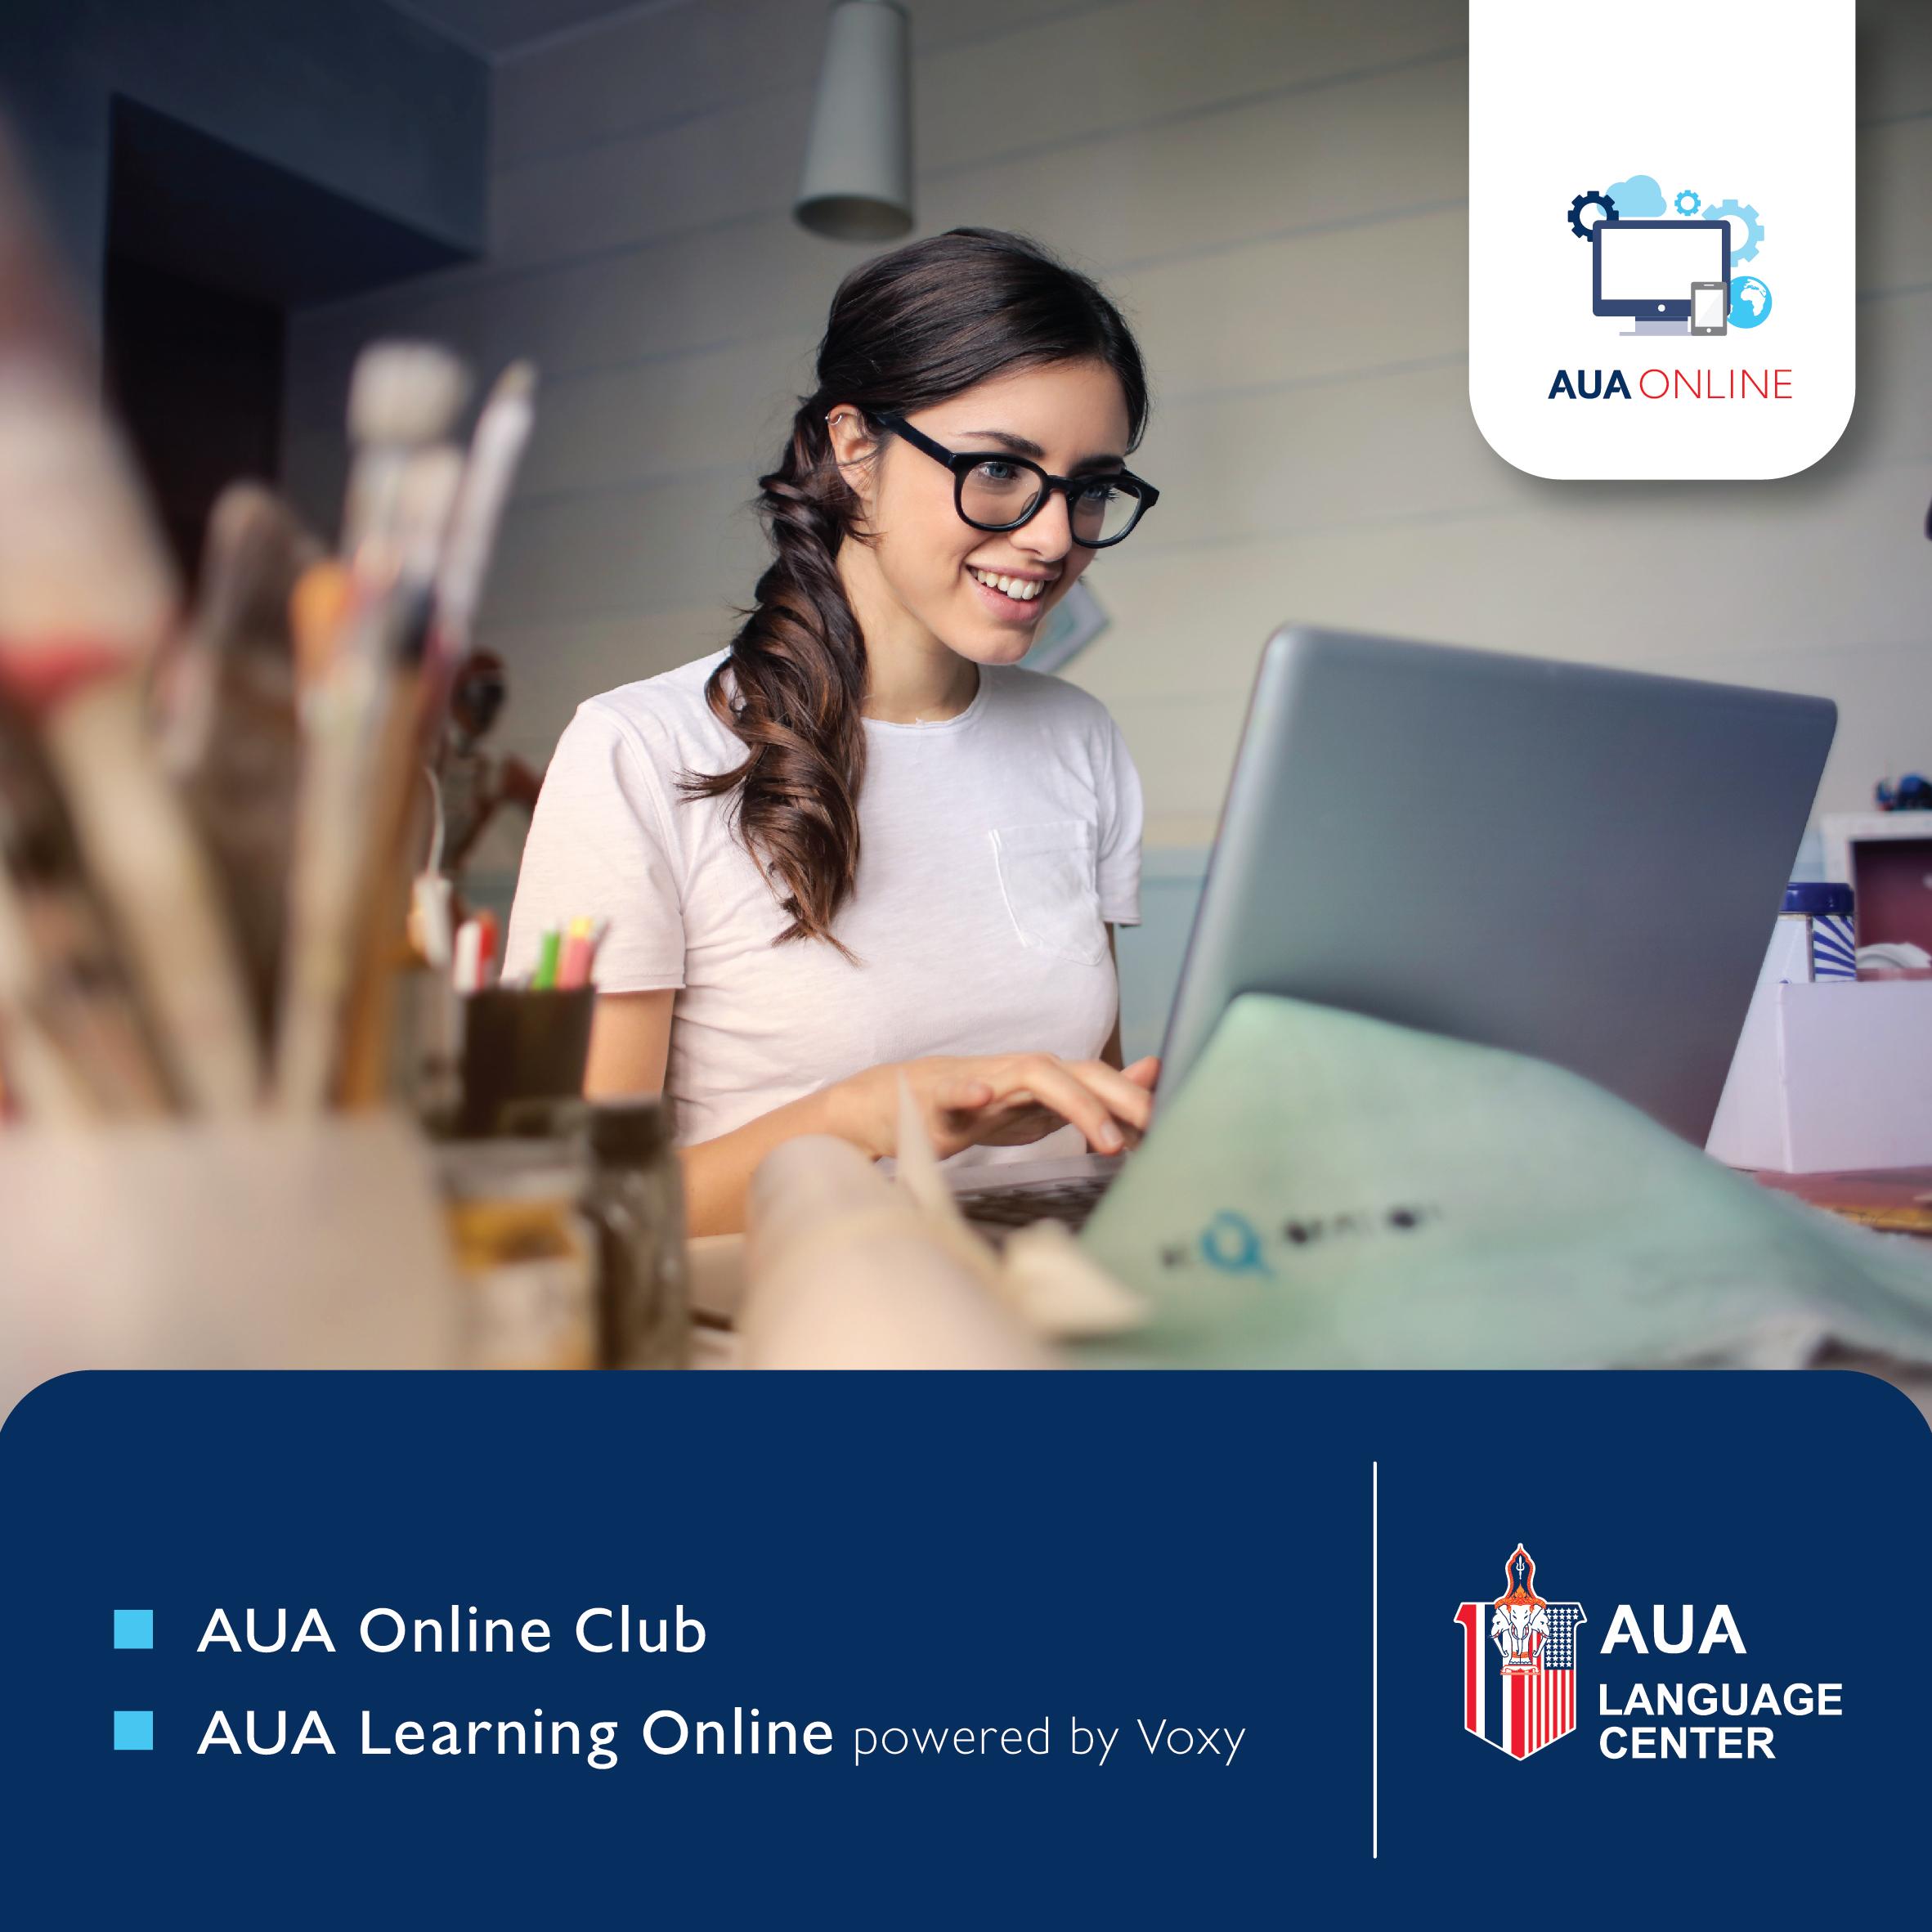 AUA Online